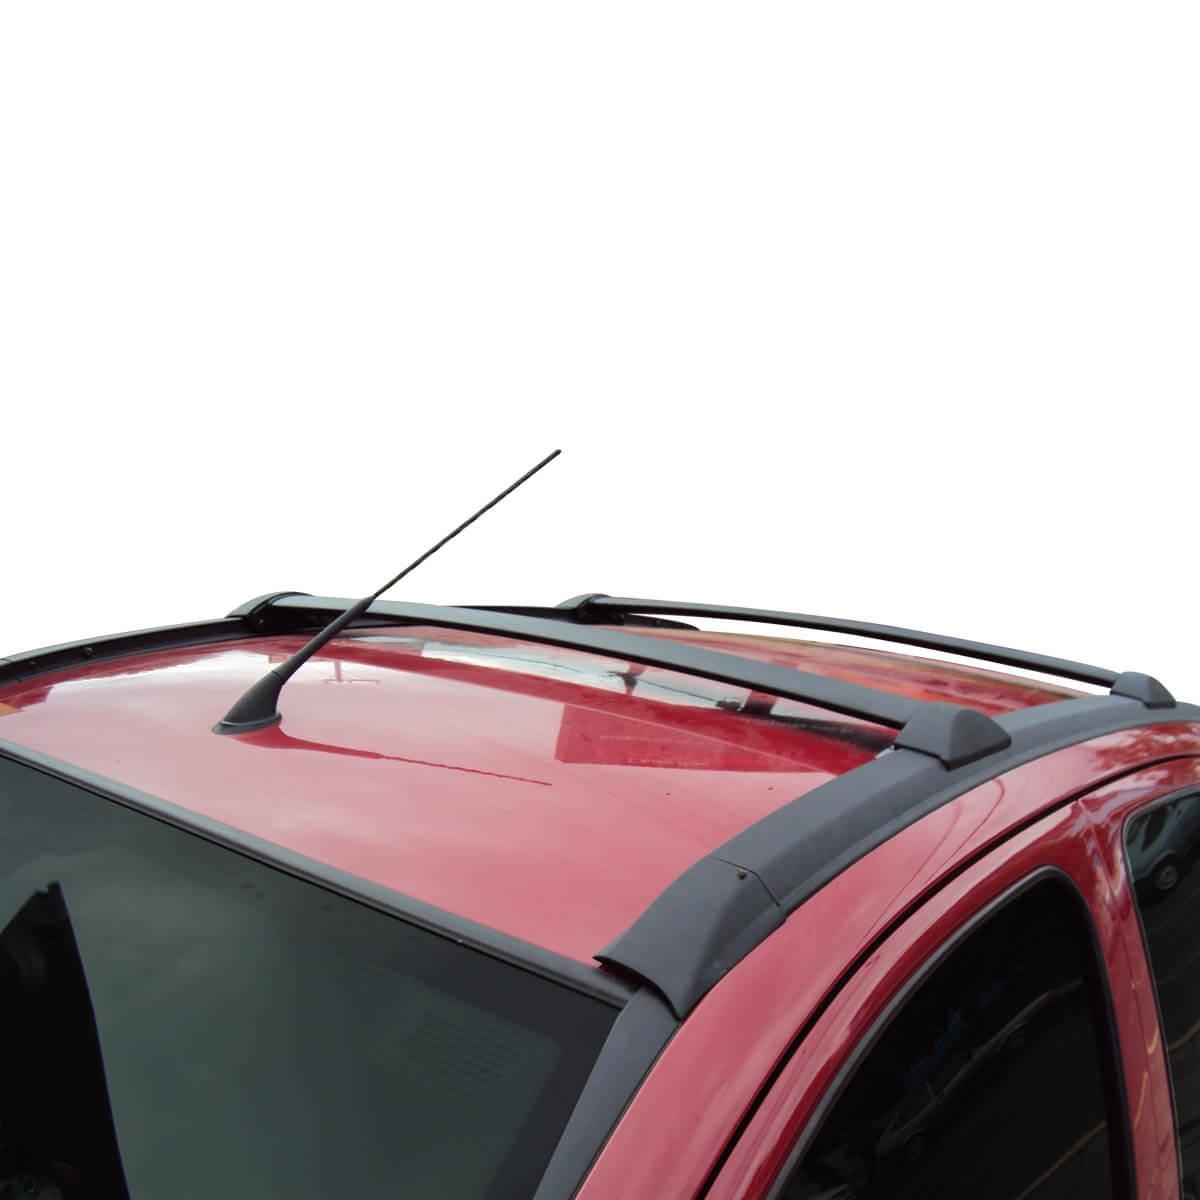 Bagageiro rack de teto Corsa Hatch 2004 a 2012 semelhante original